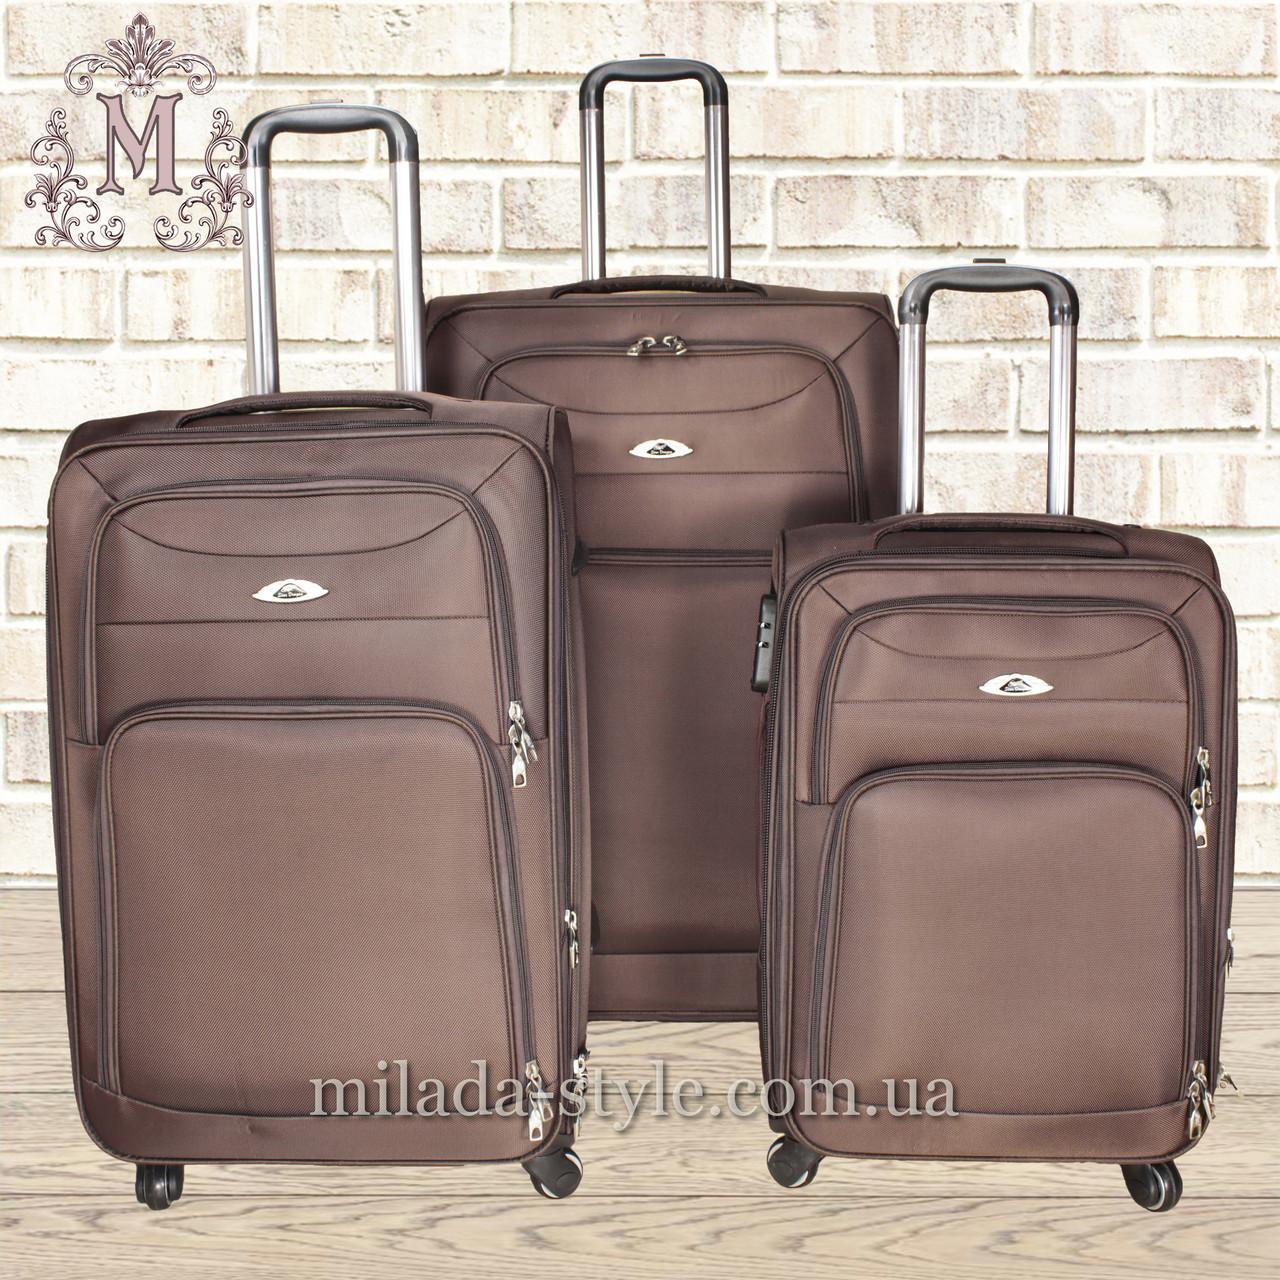 Комплект чемоданов Star Dragon